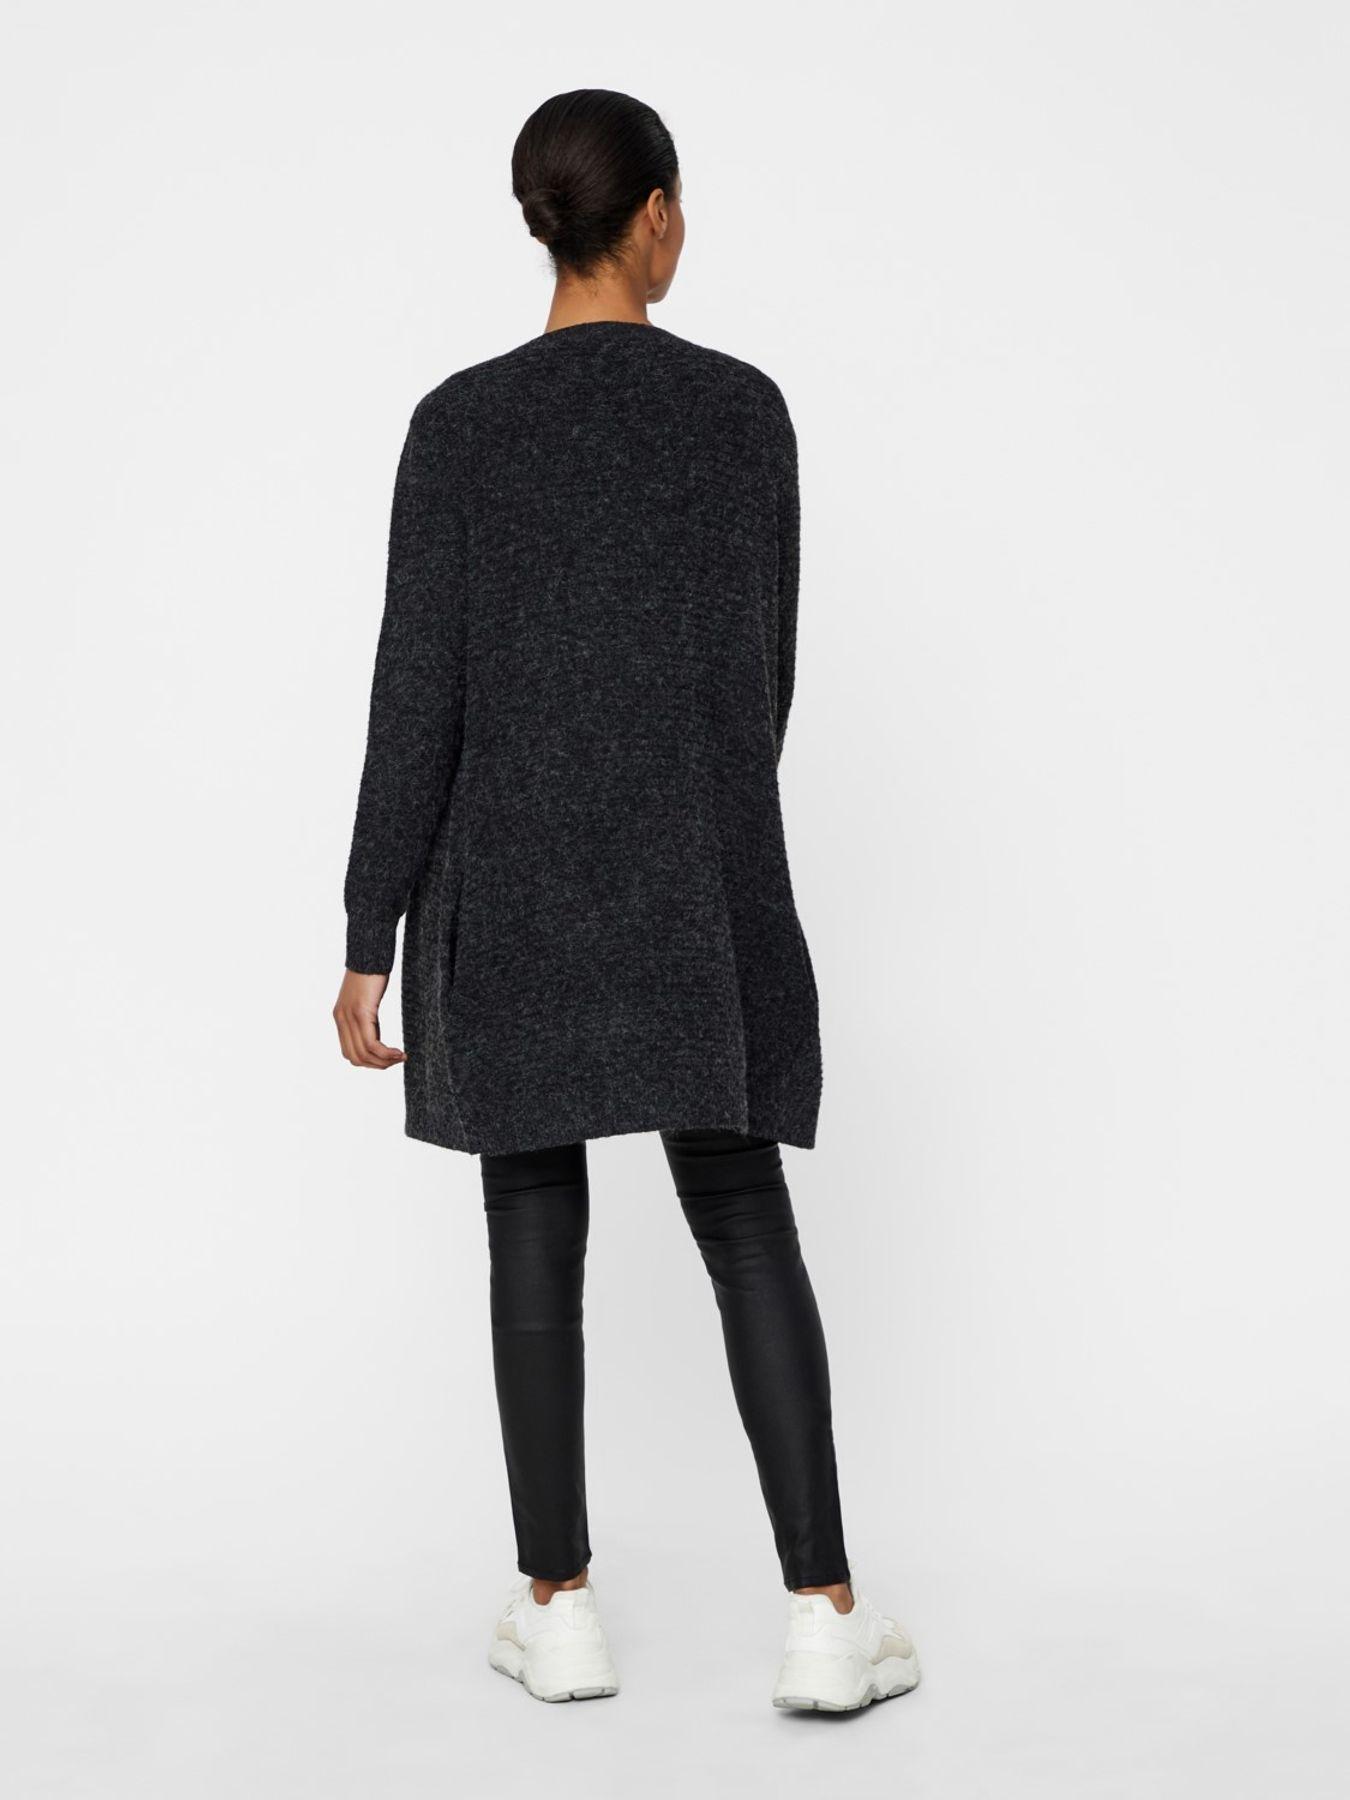 Vero Moda - Damen Strickjacke in Melange Optik, DOFFY CARDIGAN (10208150) – Bild 10